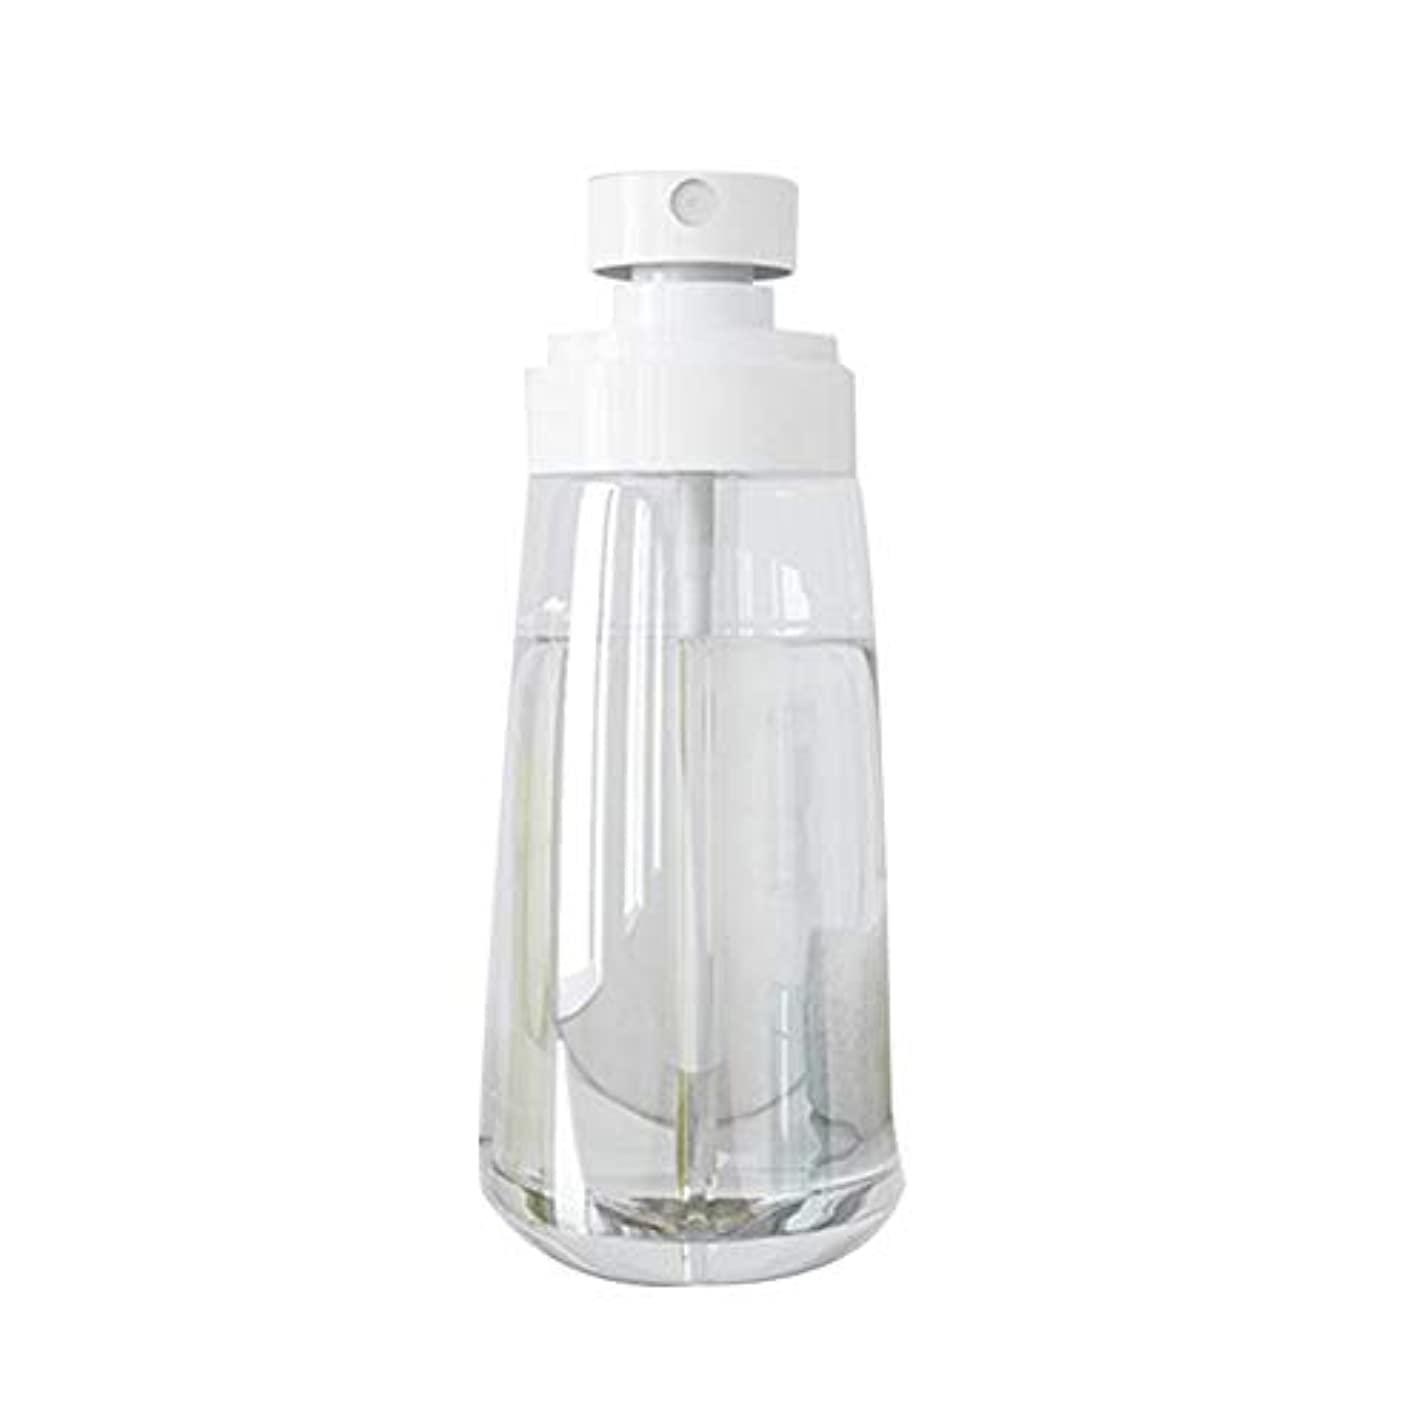 LUERME スプレーボルト 60ml PET製 化粧水の詰替用 極細のミストを噴霧する 旅行用の霧吹き 小分けの容器 アルコール消毒用 アトマイザー